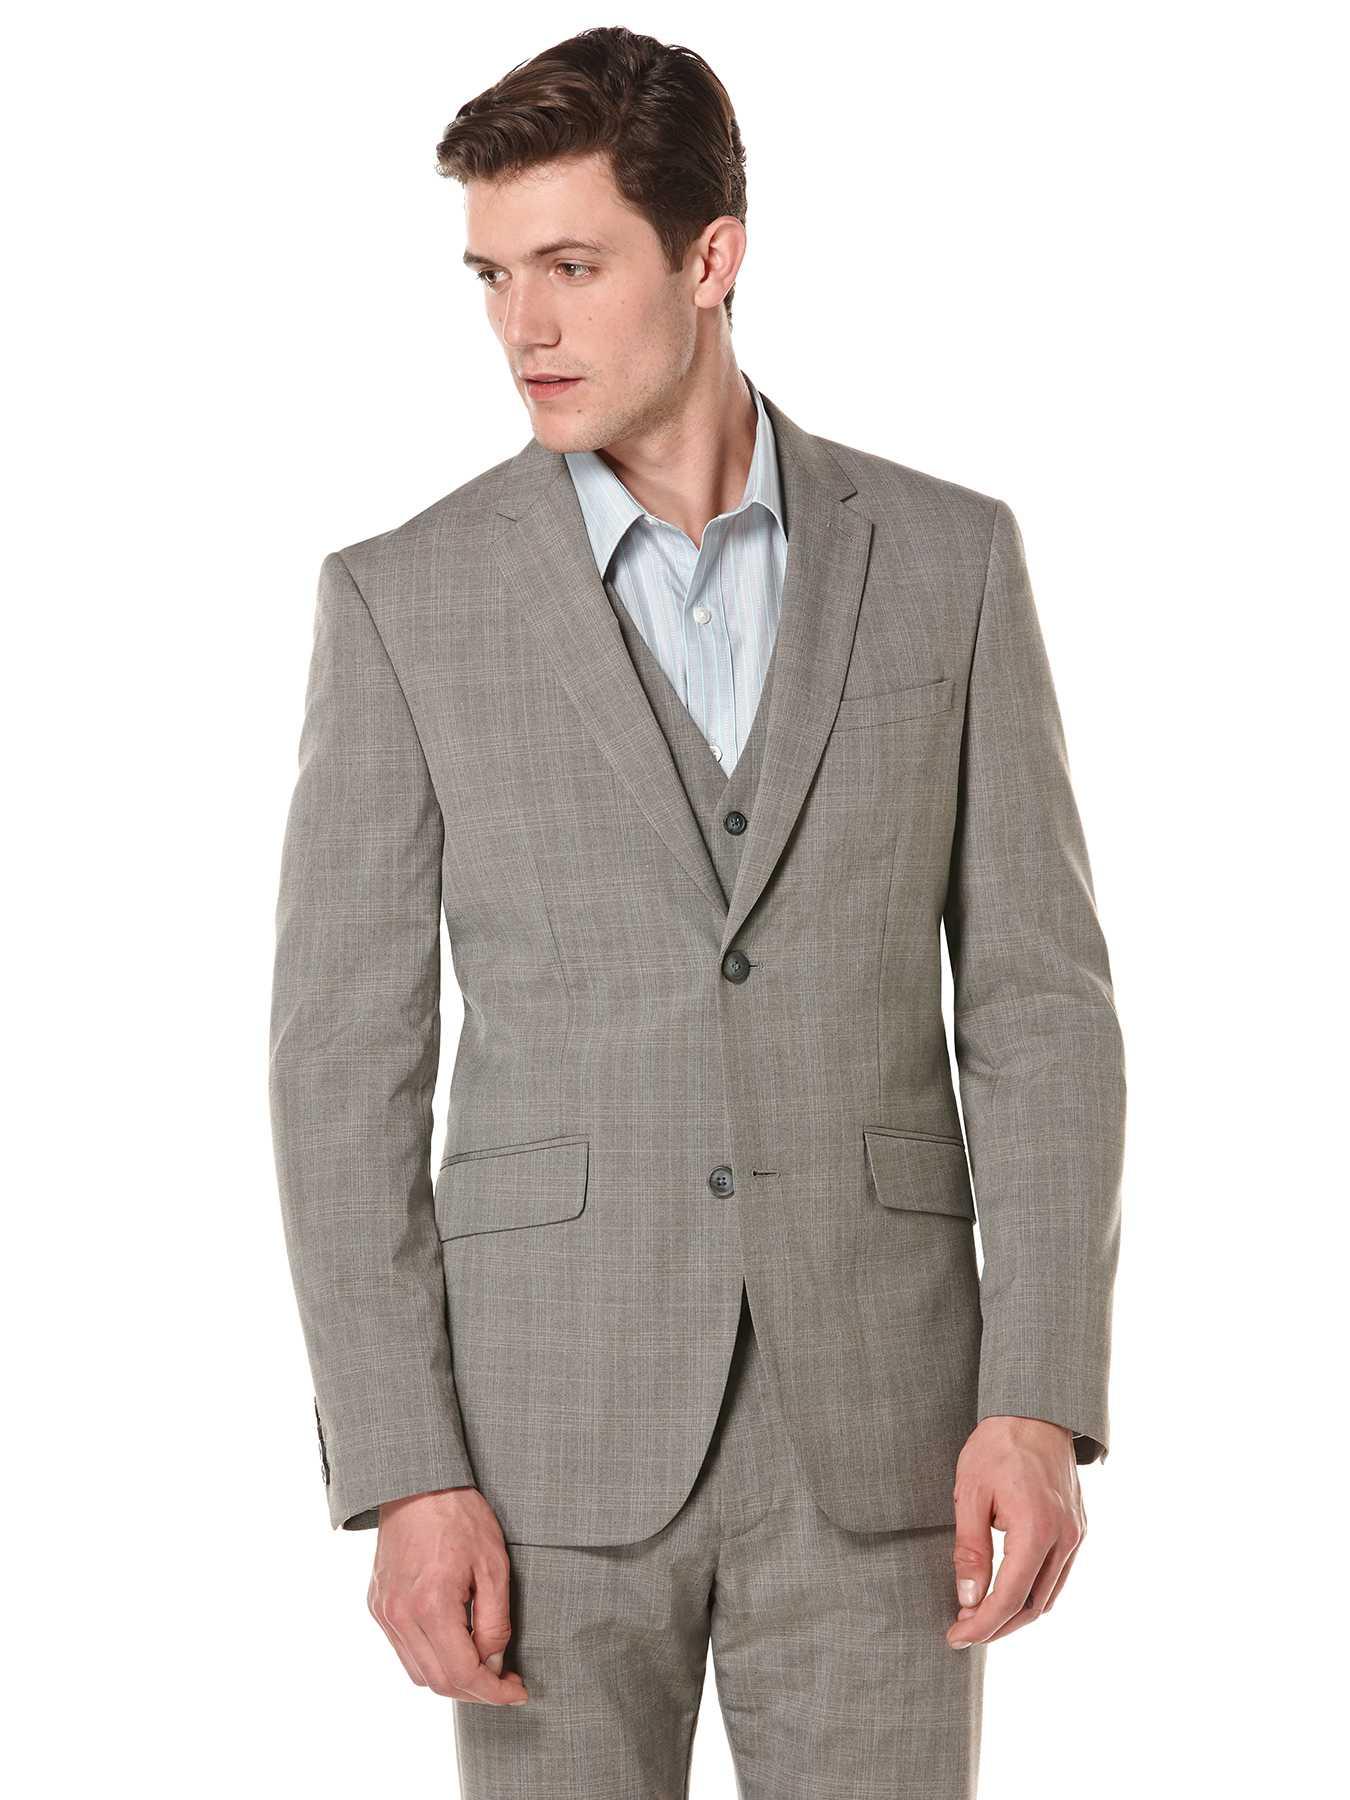 Perry Ellis Plaid Heather Two Button Suit Jacket